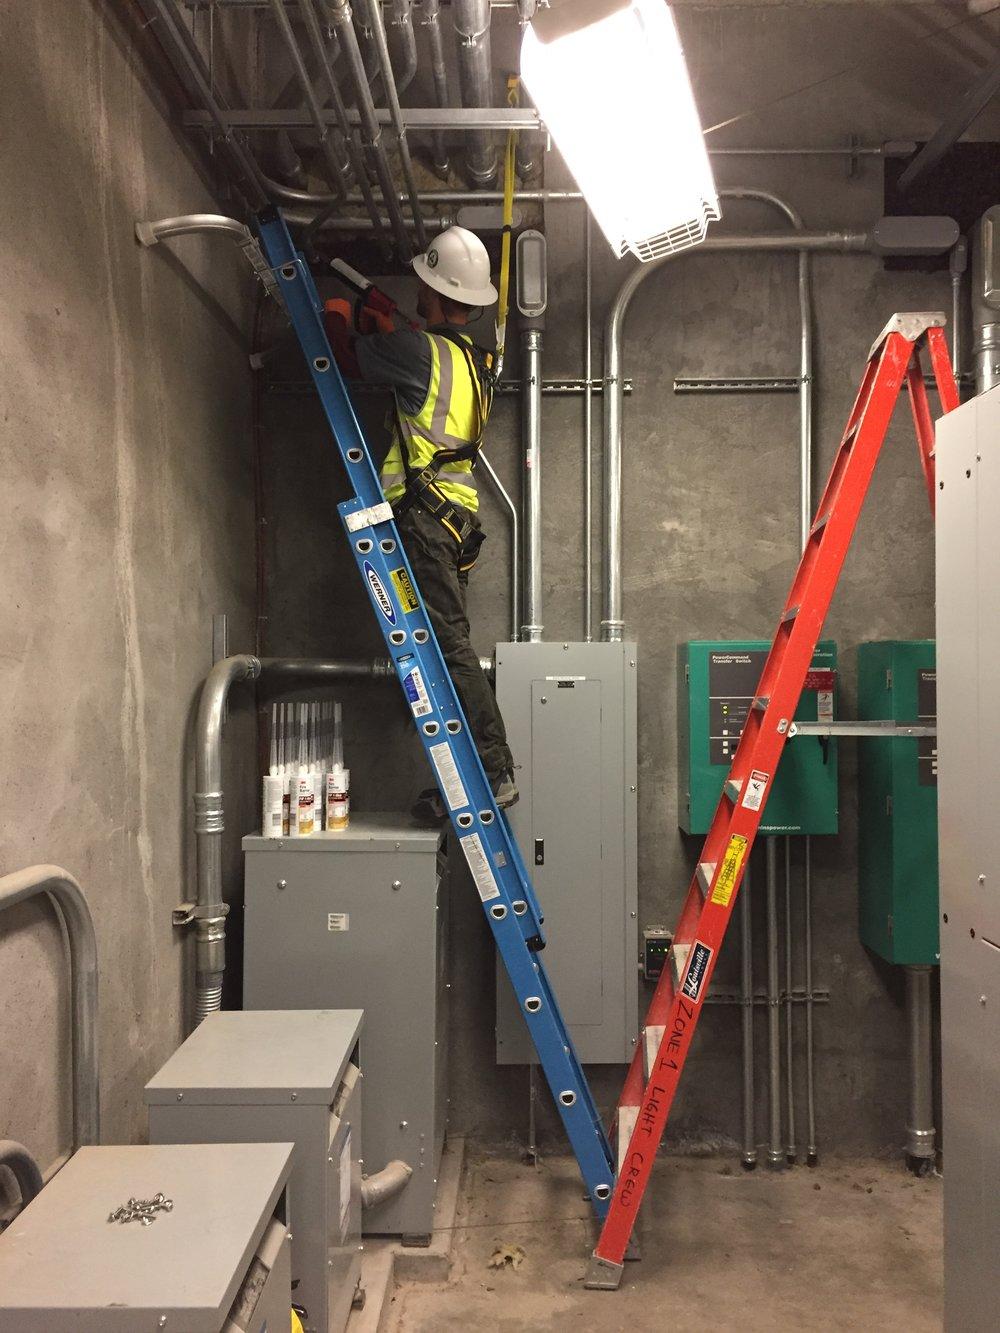 emtech's safety standard